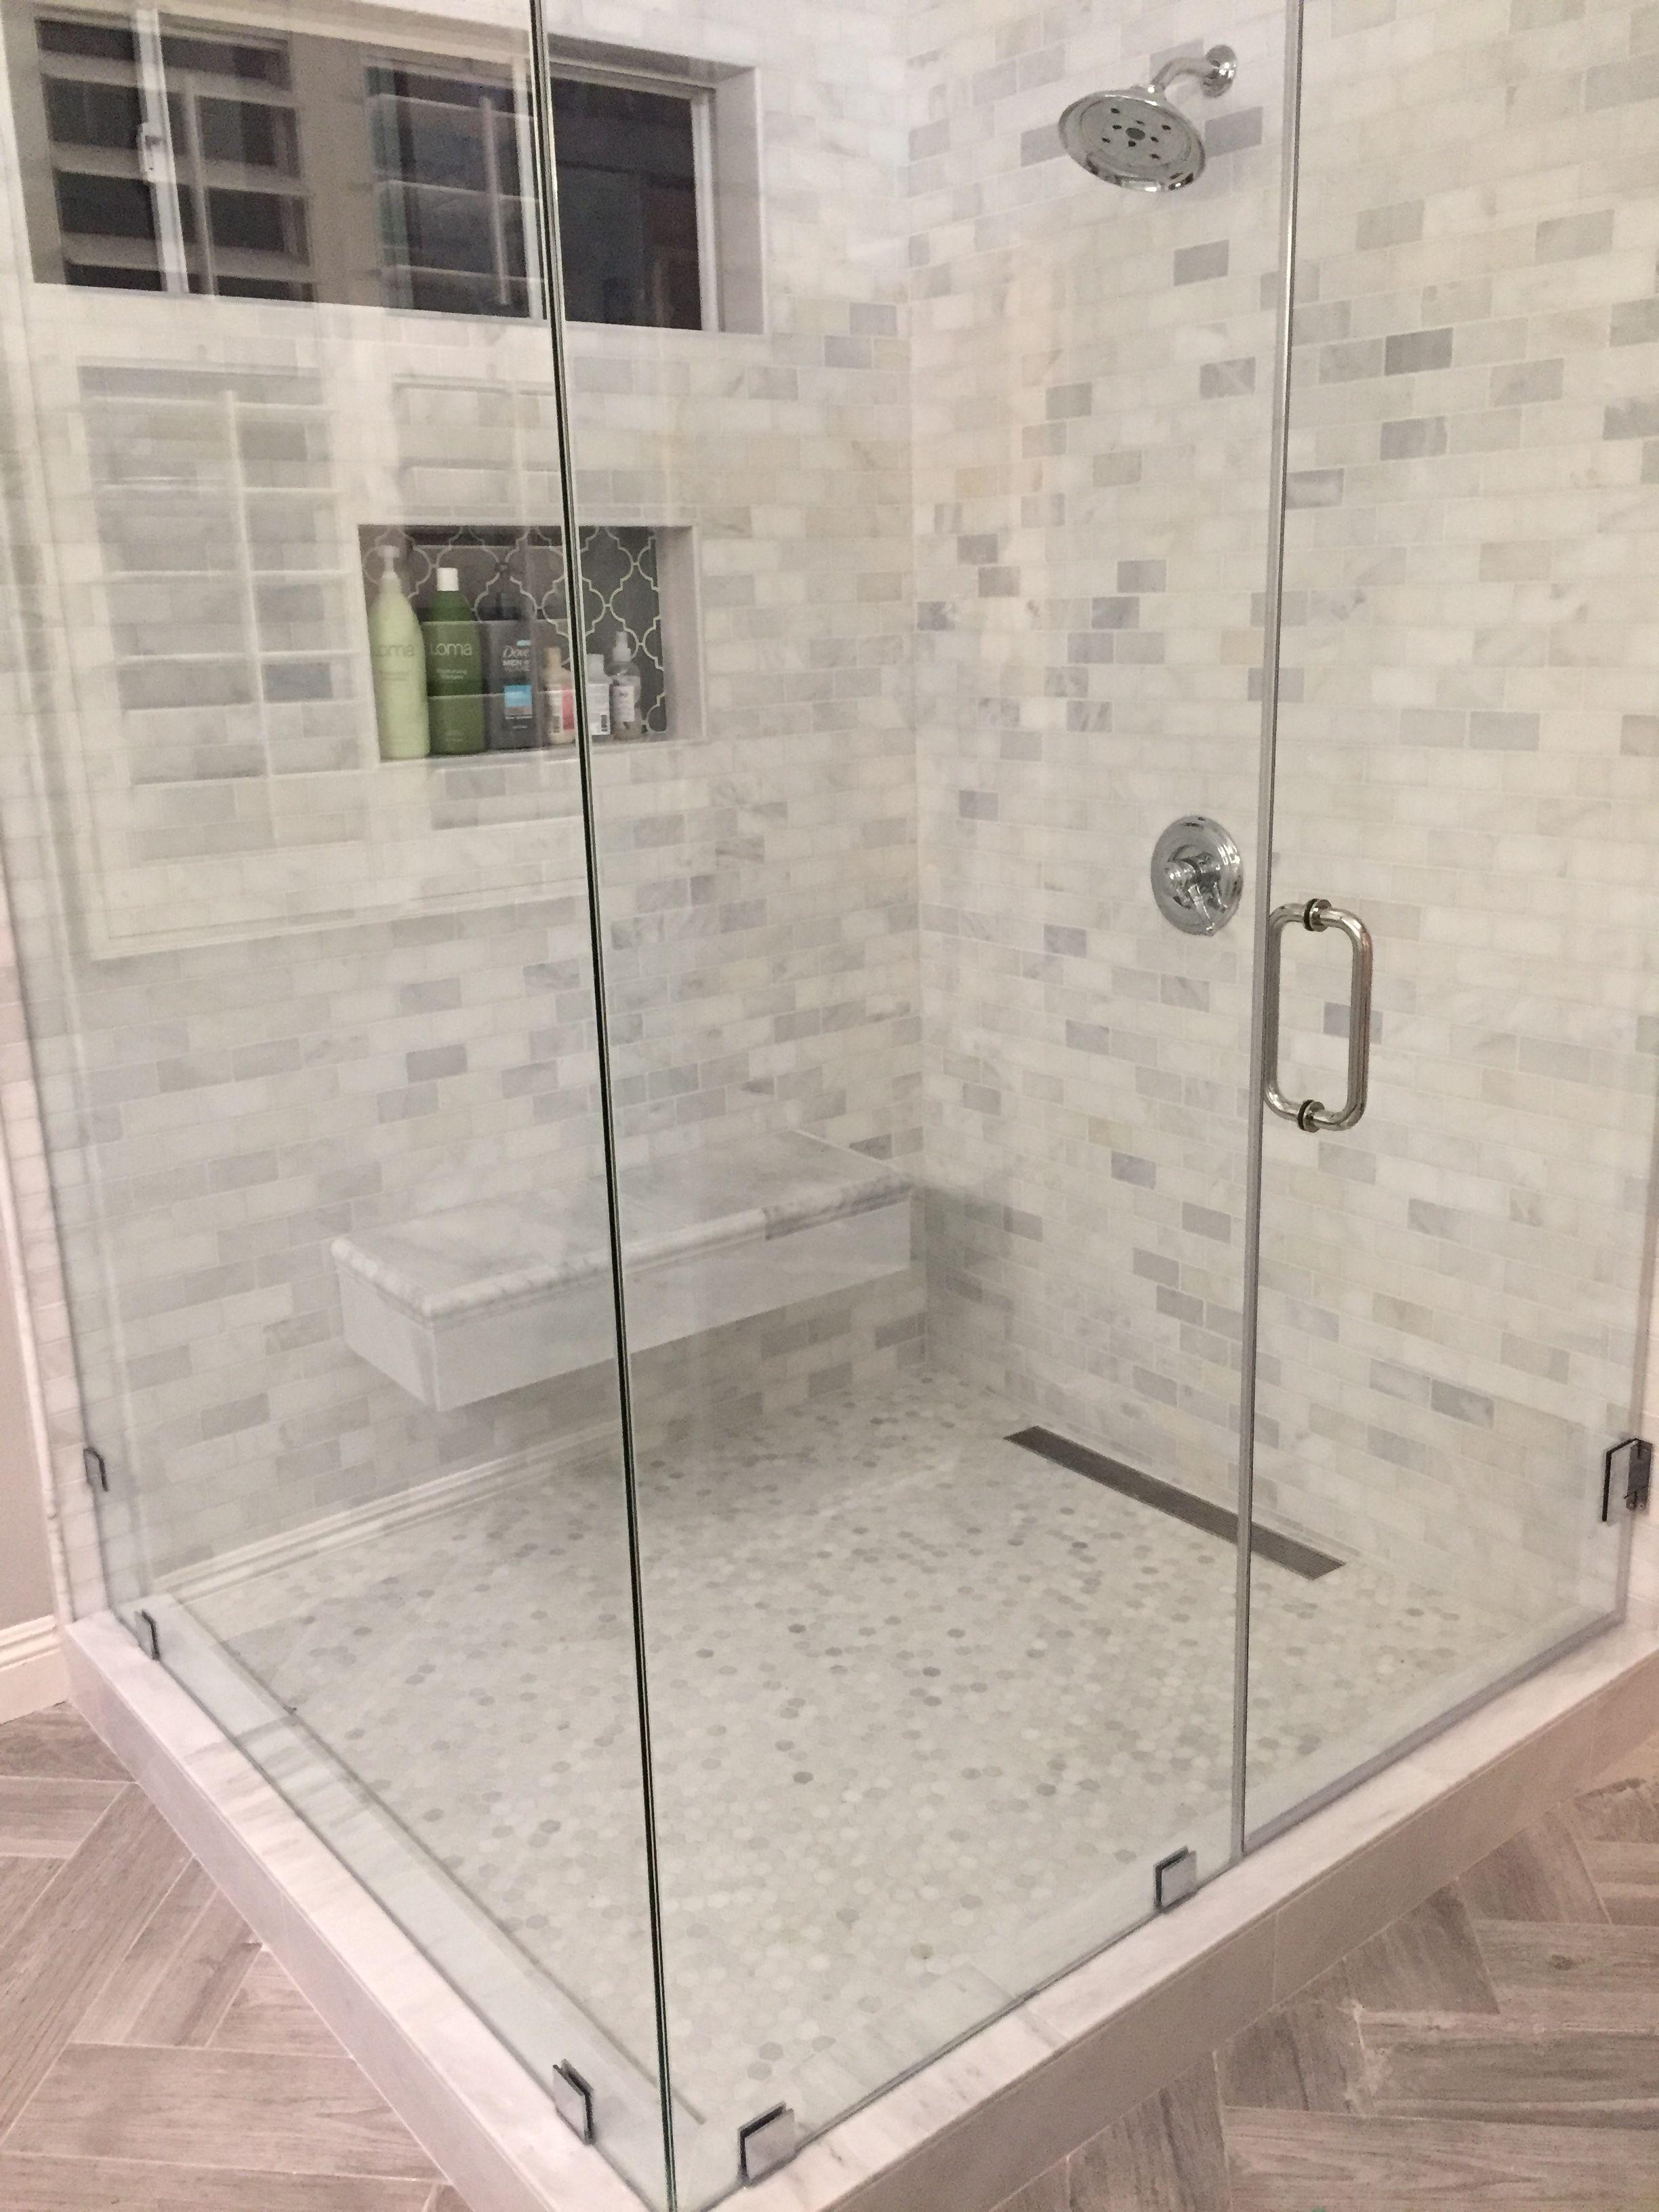 Asia Carrera Marble new carrera marble shower, herringbone wood tile floor